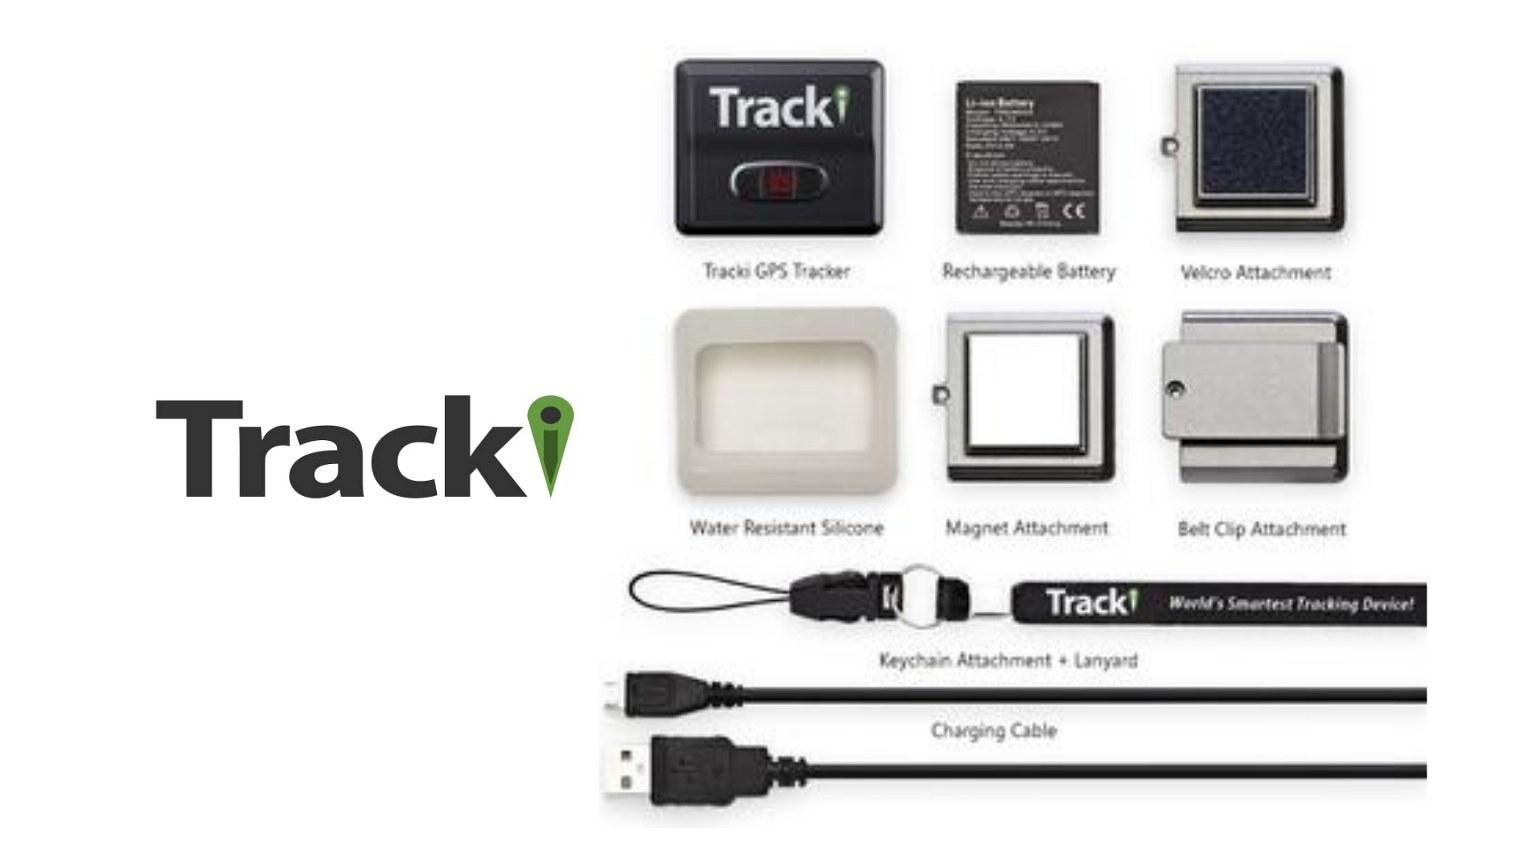 Tracki Box